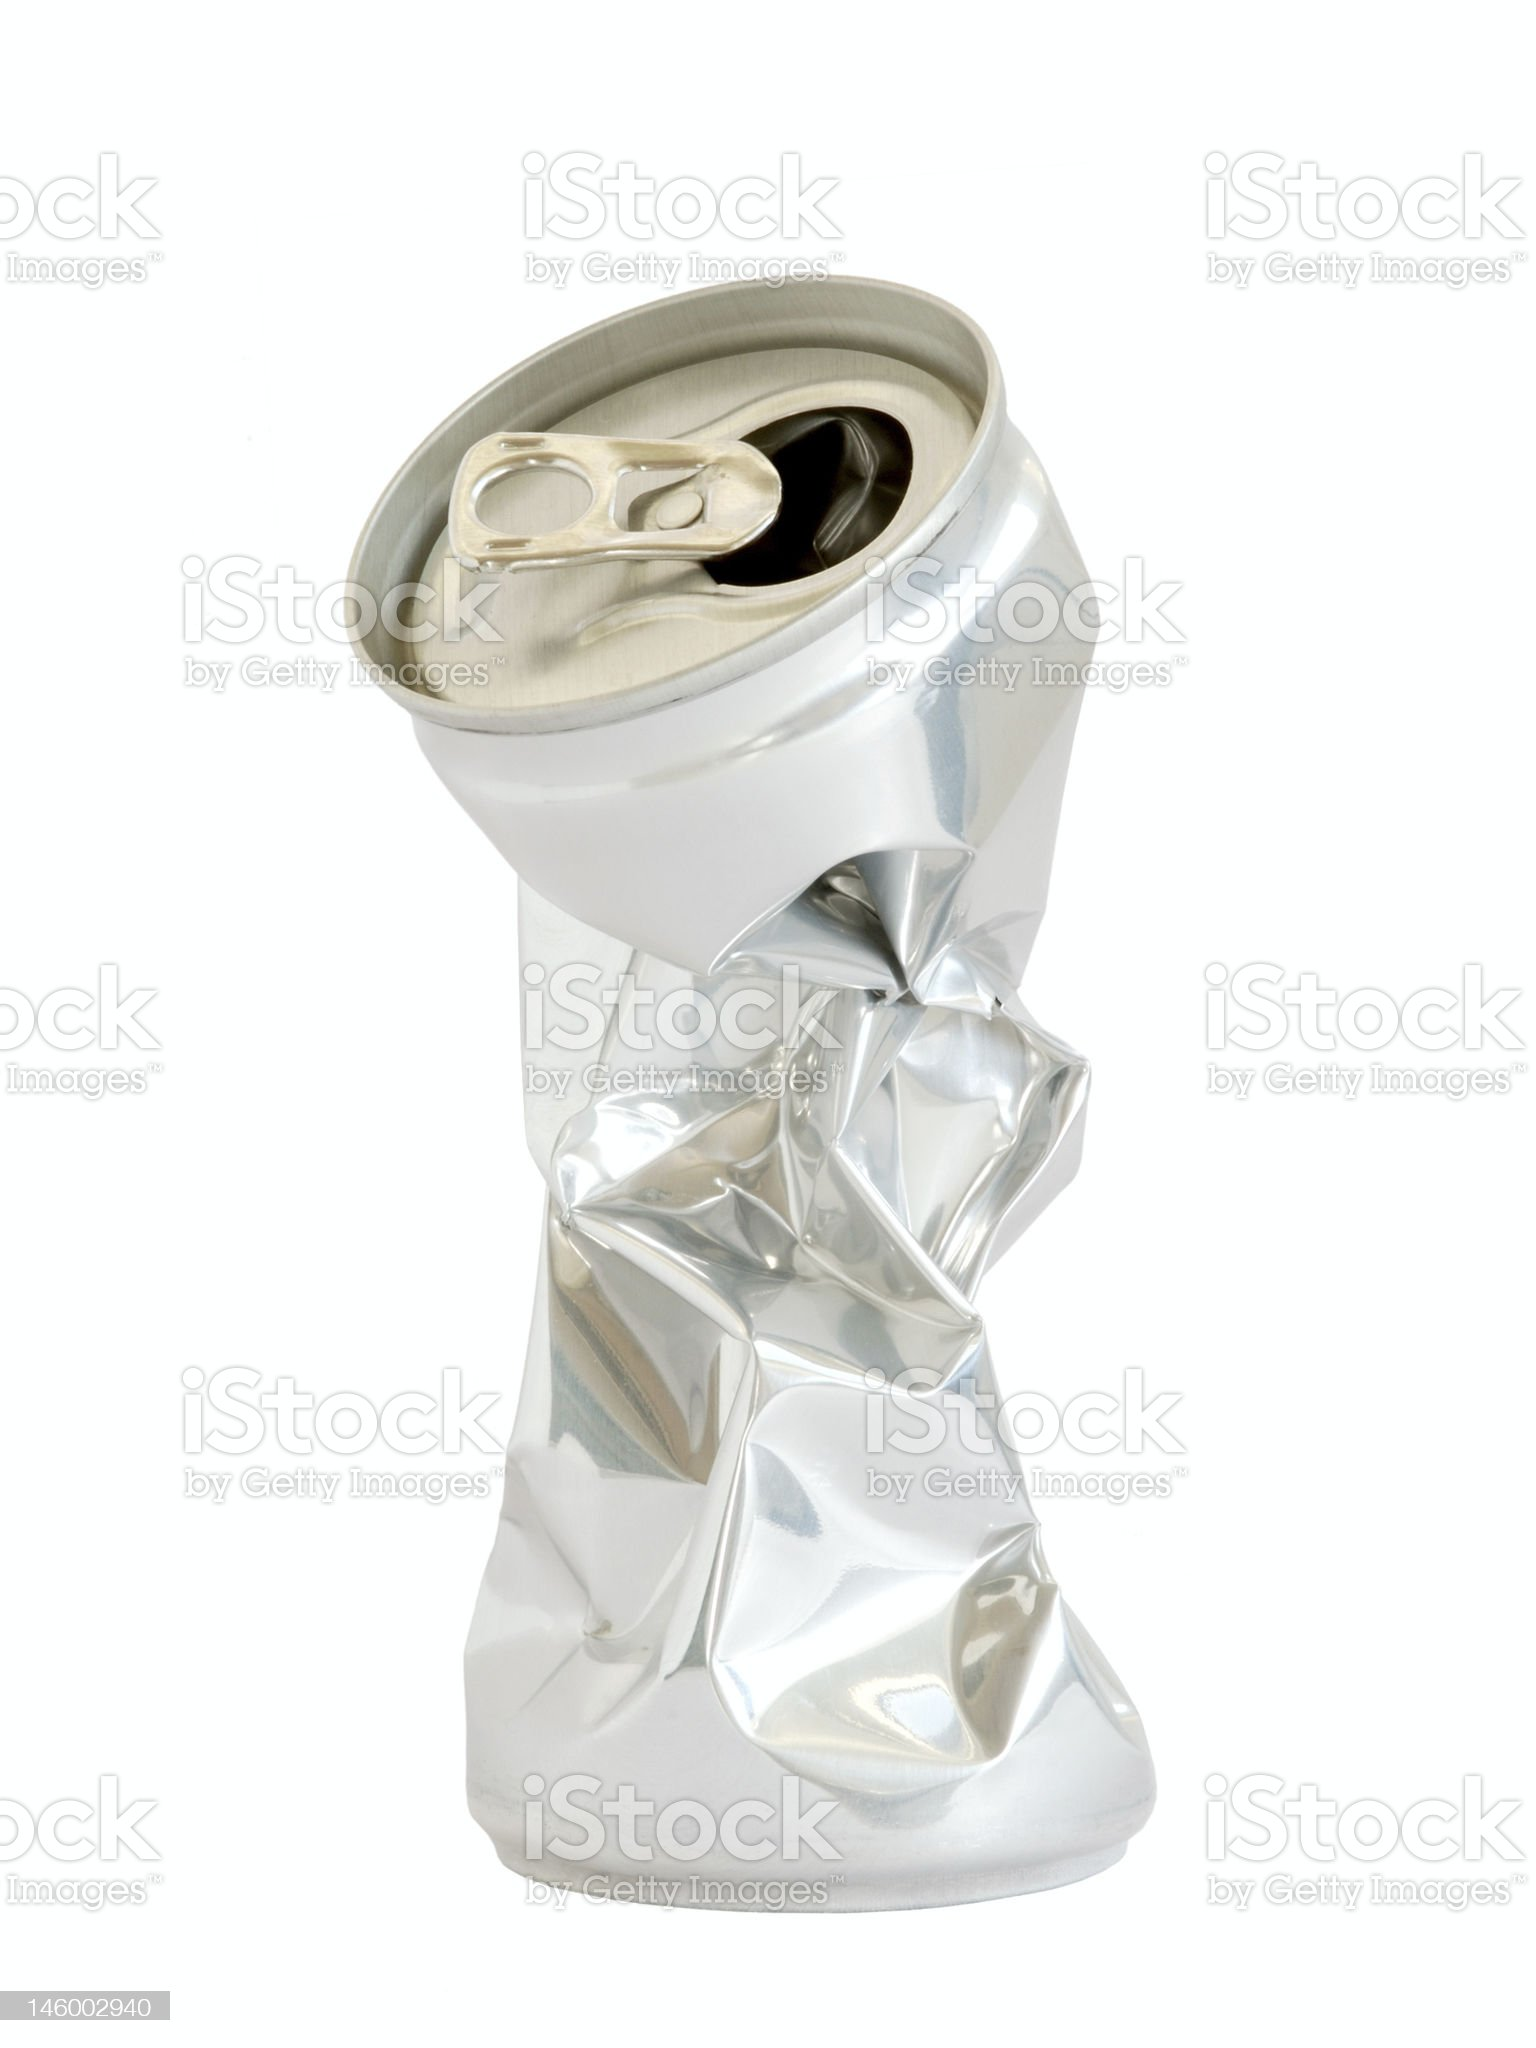 Aluminium drink container royalty-free stock photo